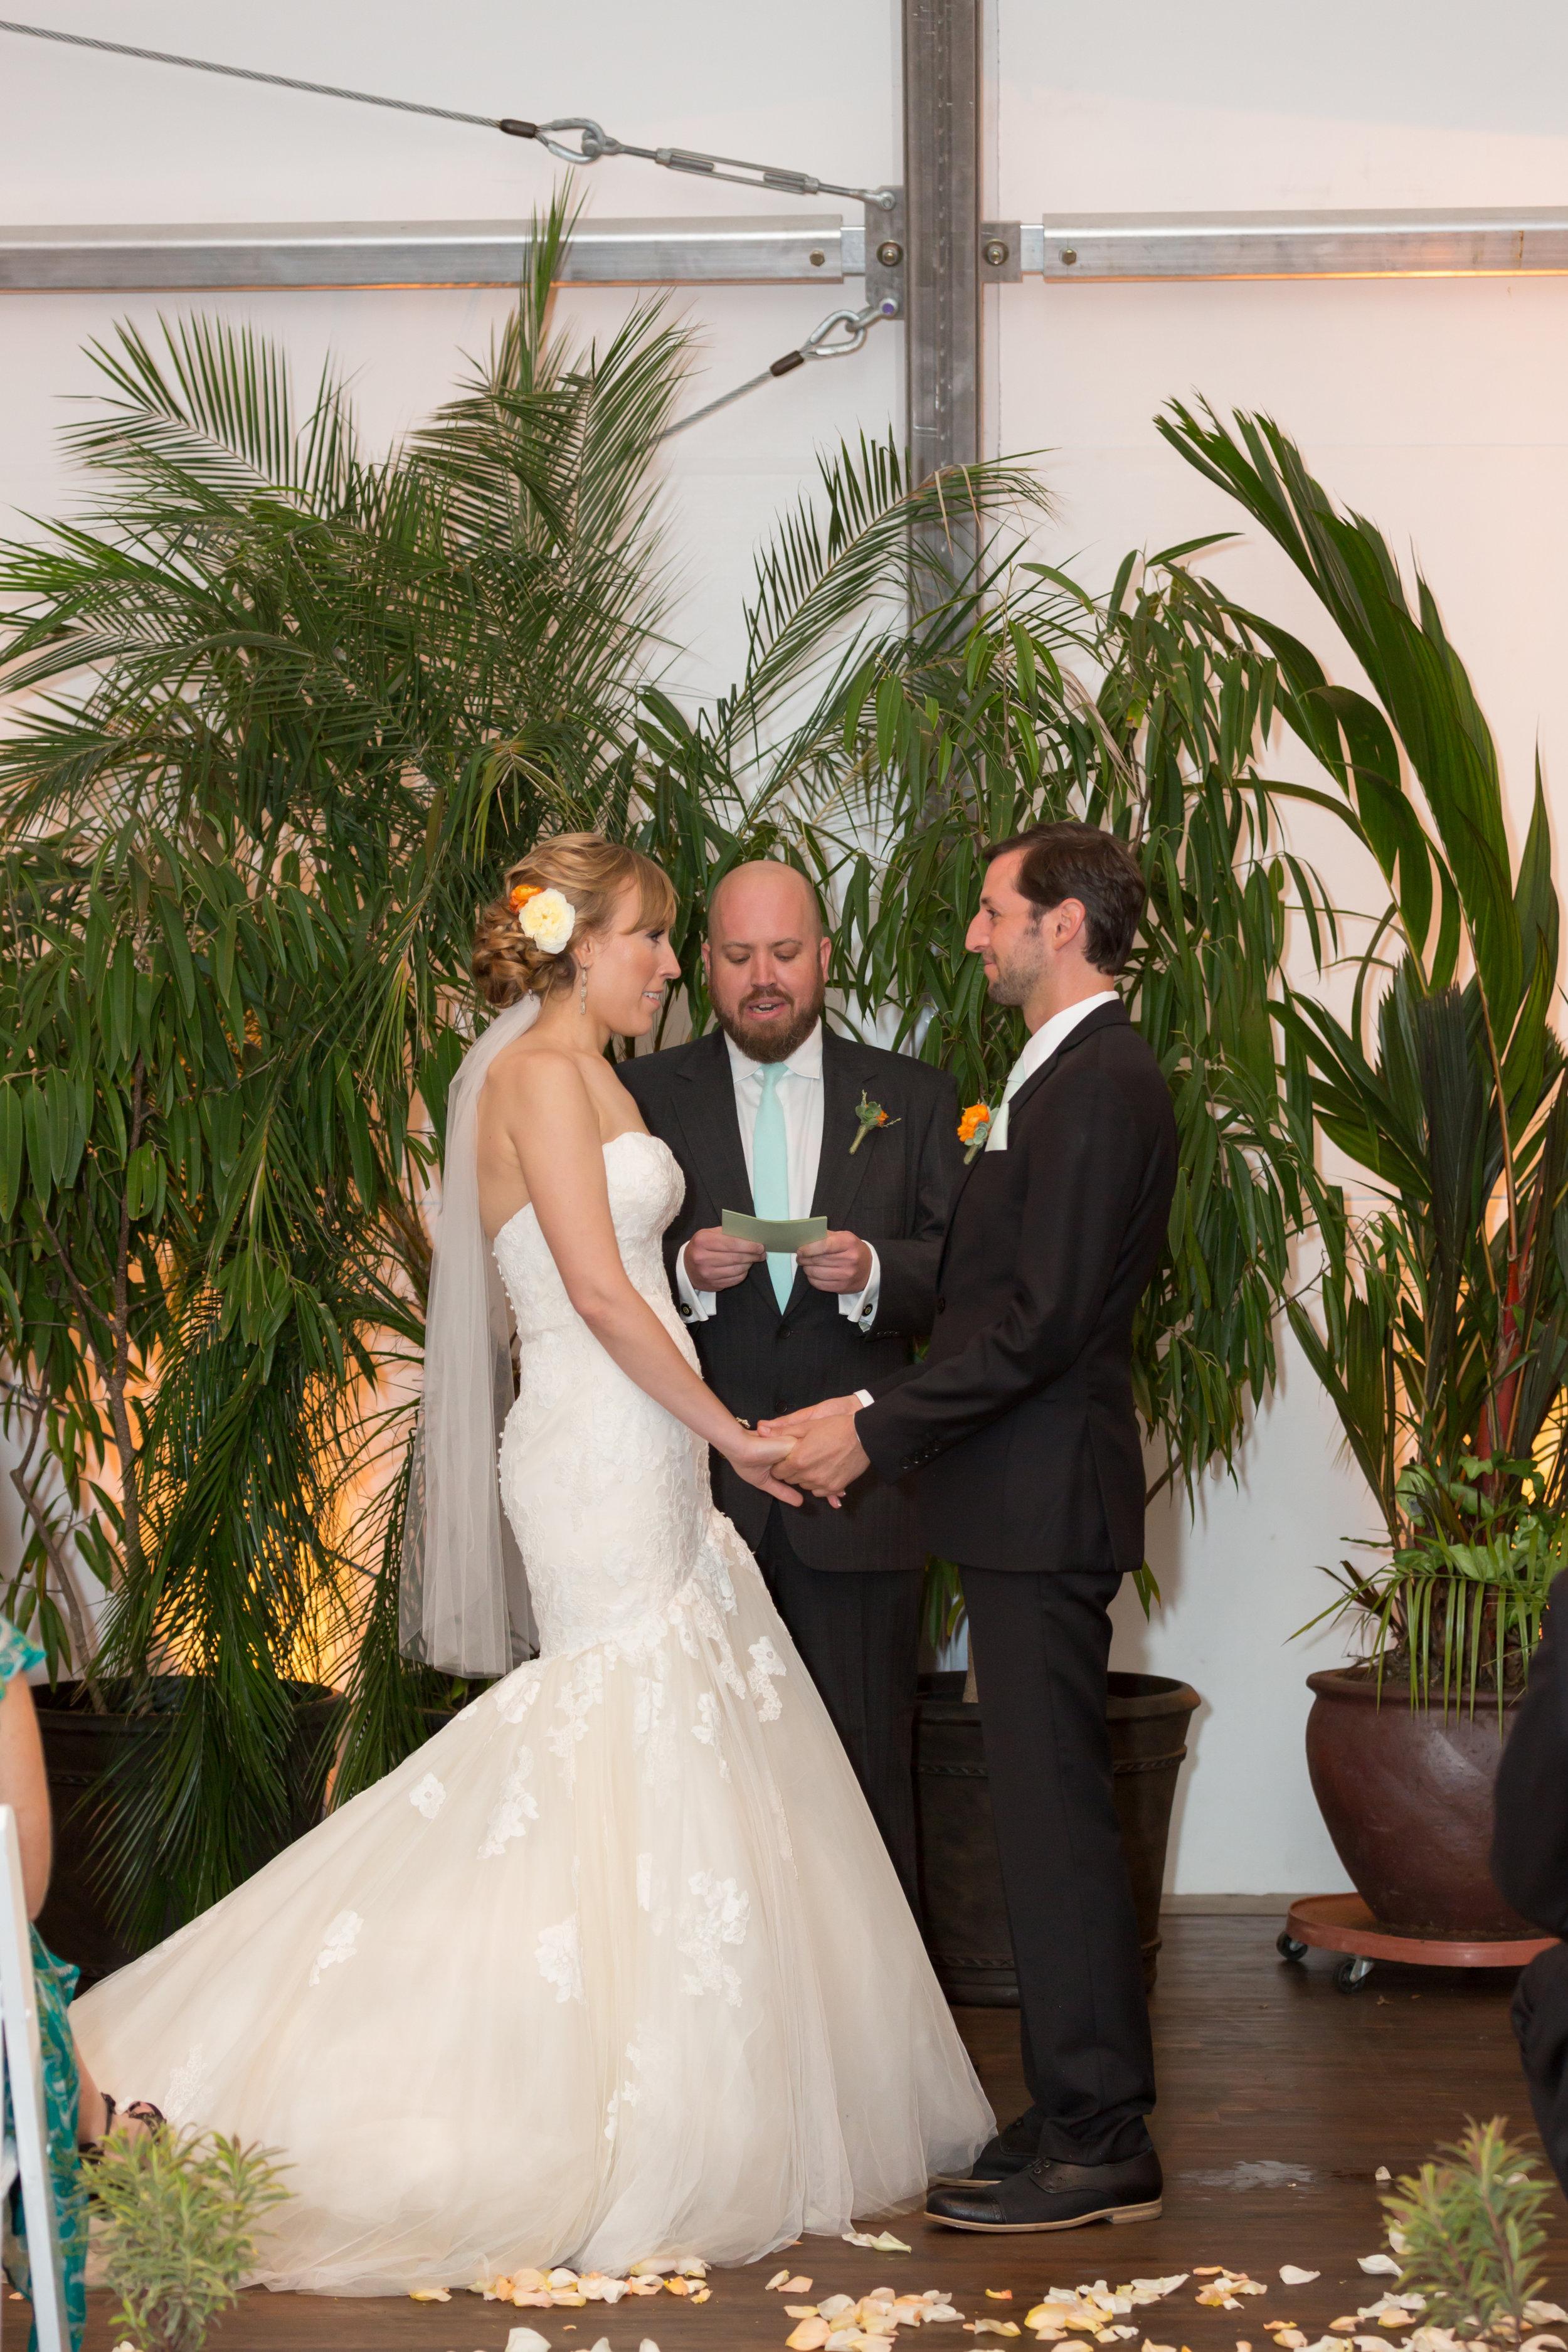 San-Francisco-Wedding-43.jpg